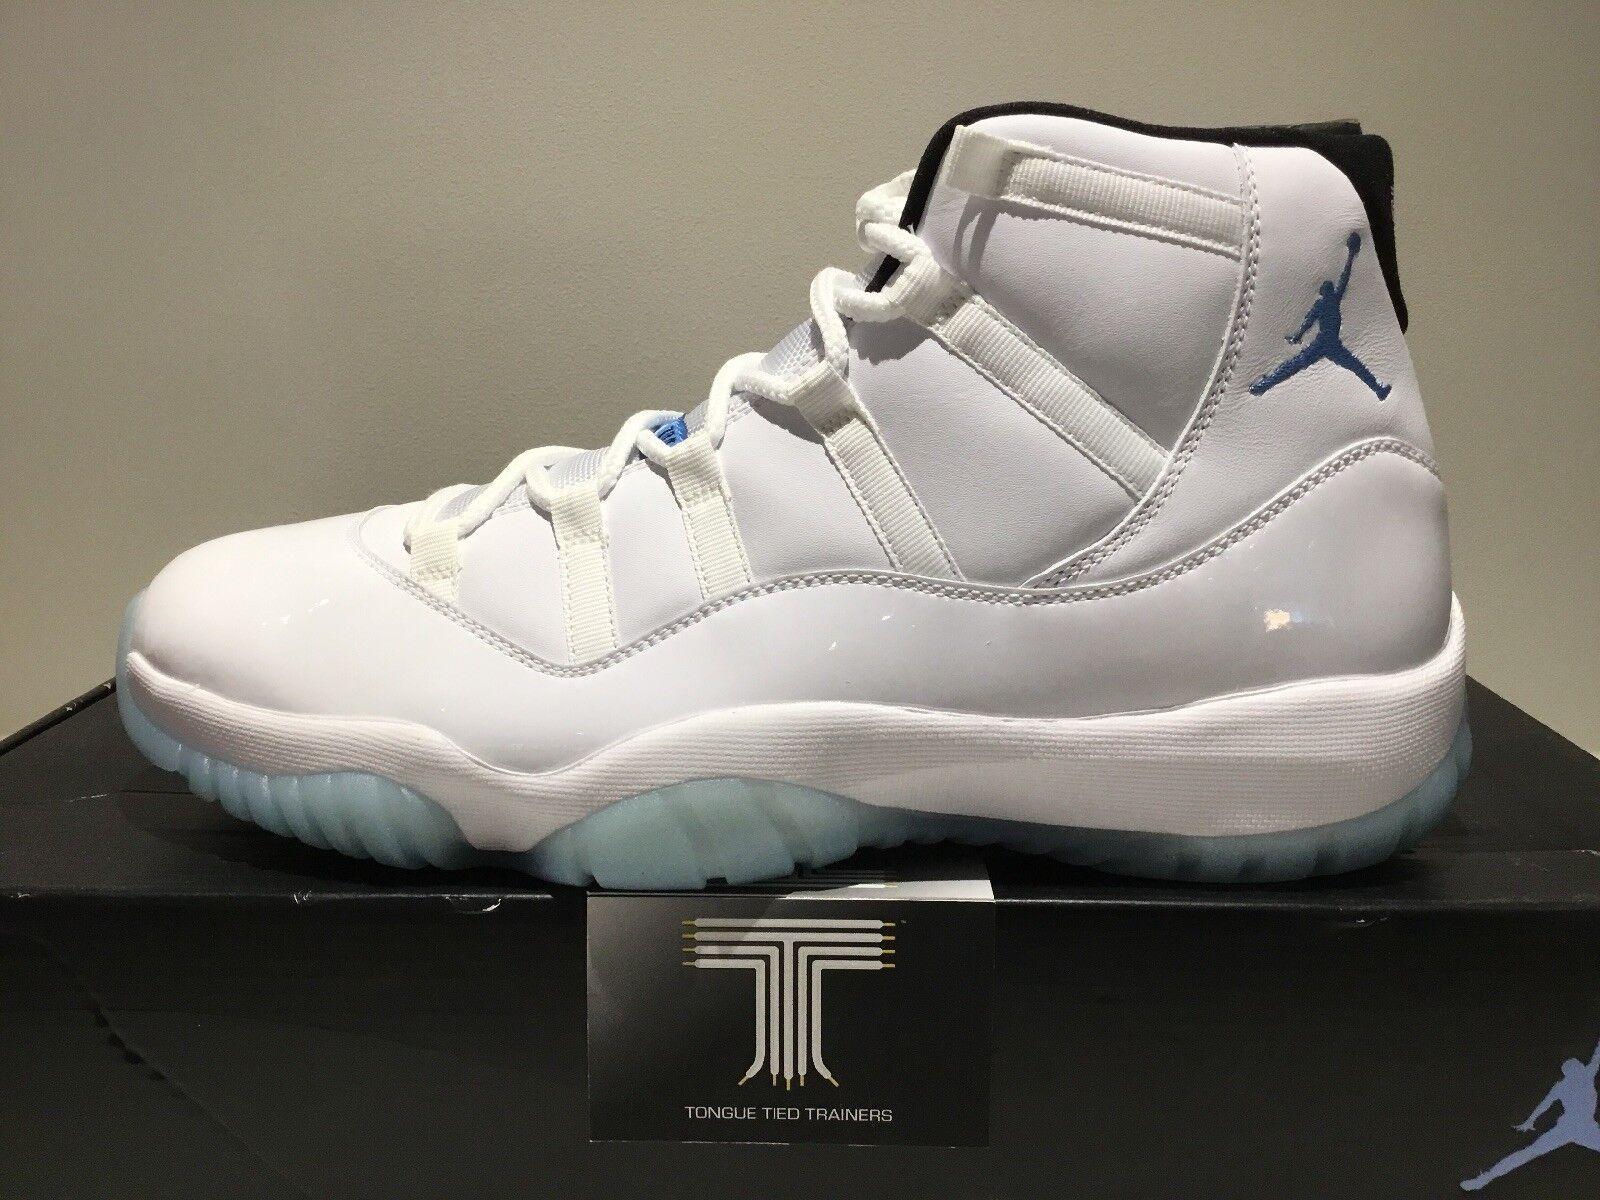 Nike Air Jordan 11 Retro Legend Bleu ~ 378037 117 ~ Uk